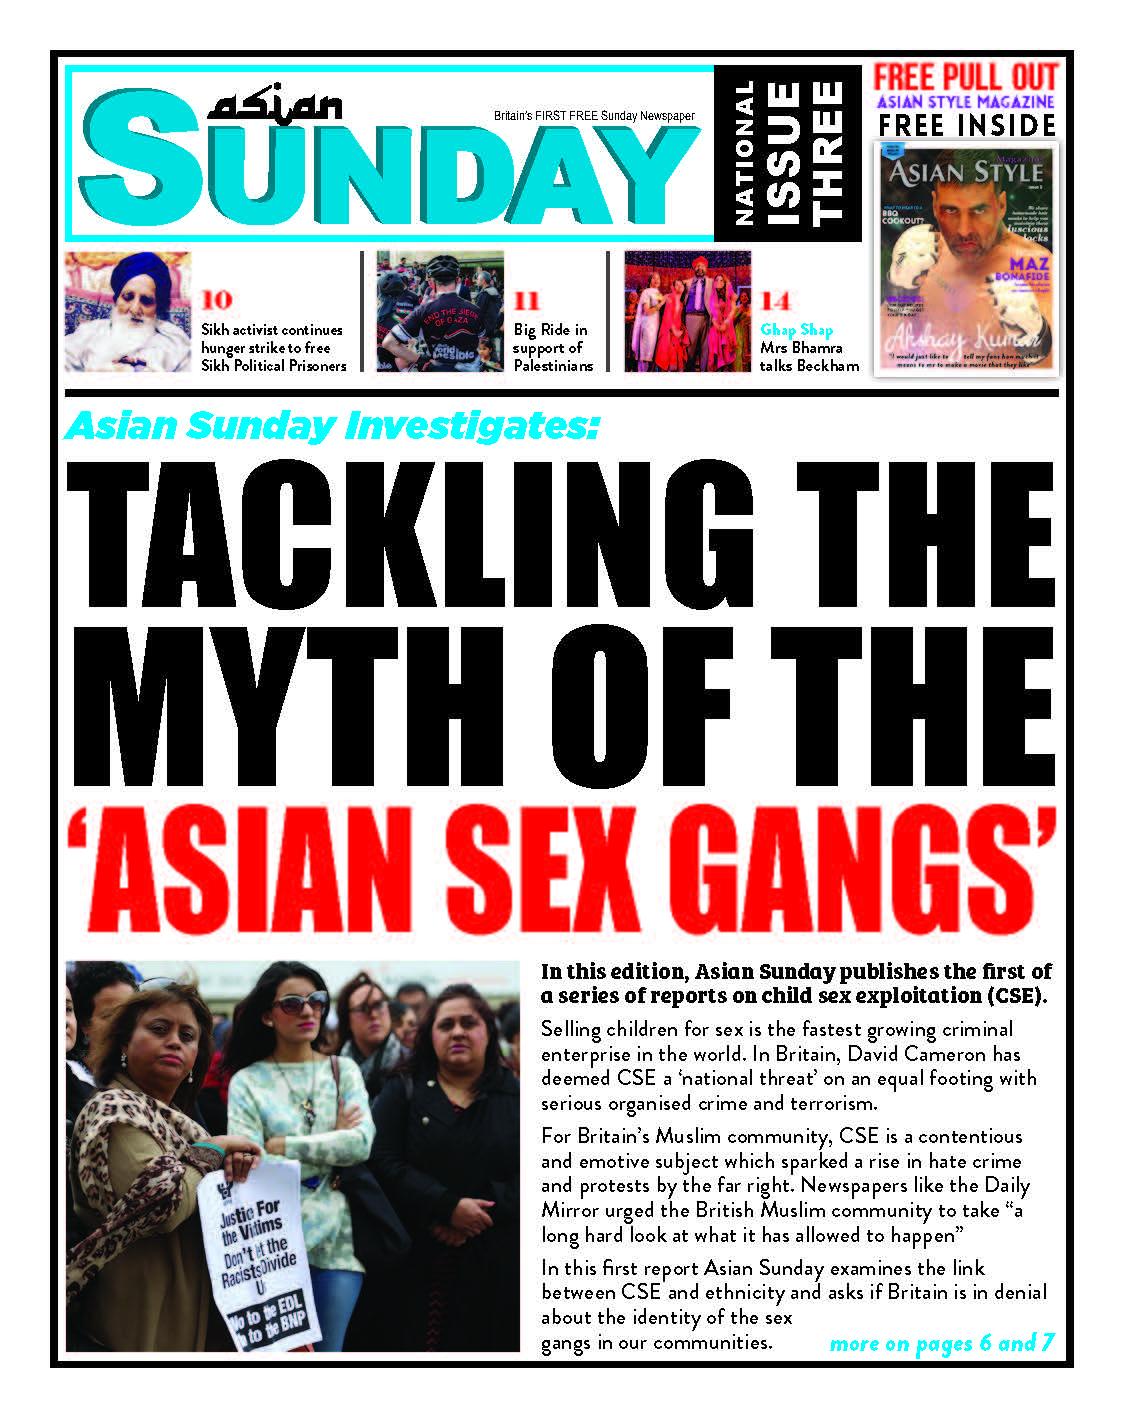 Asian gang investigators